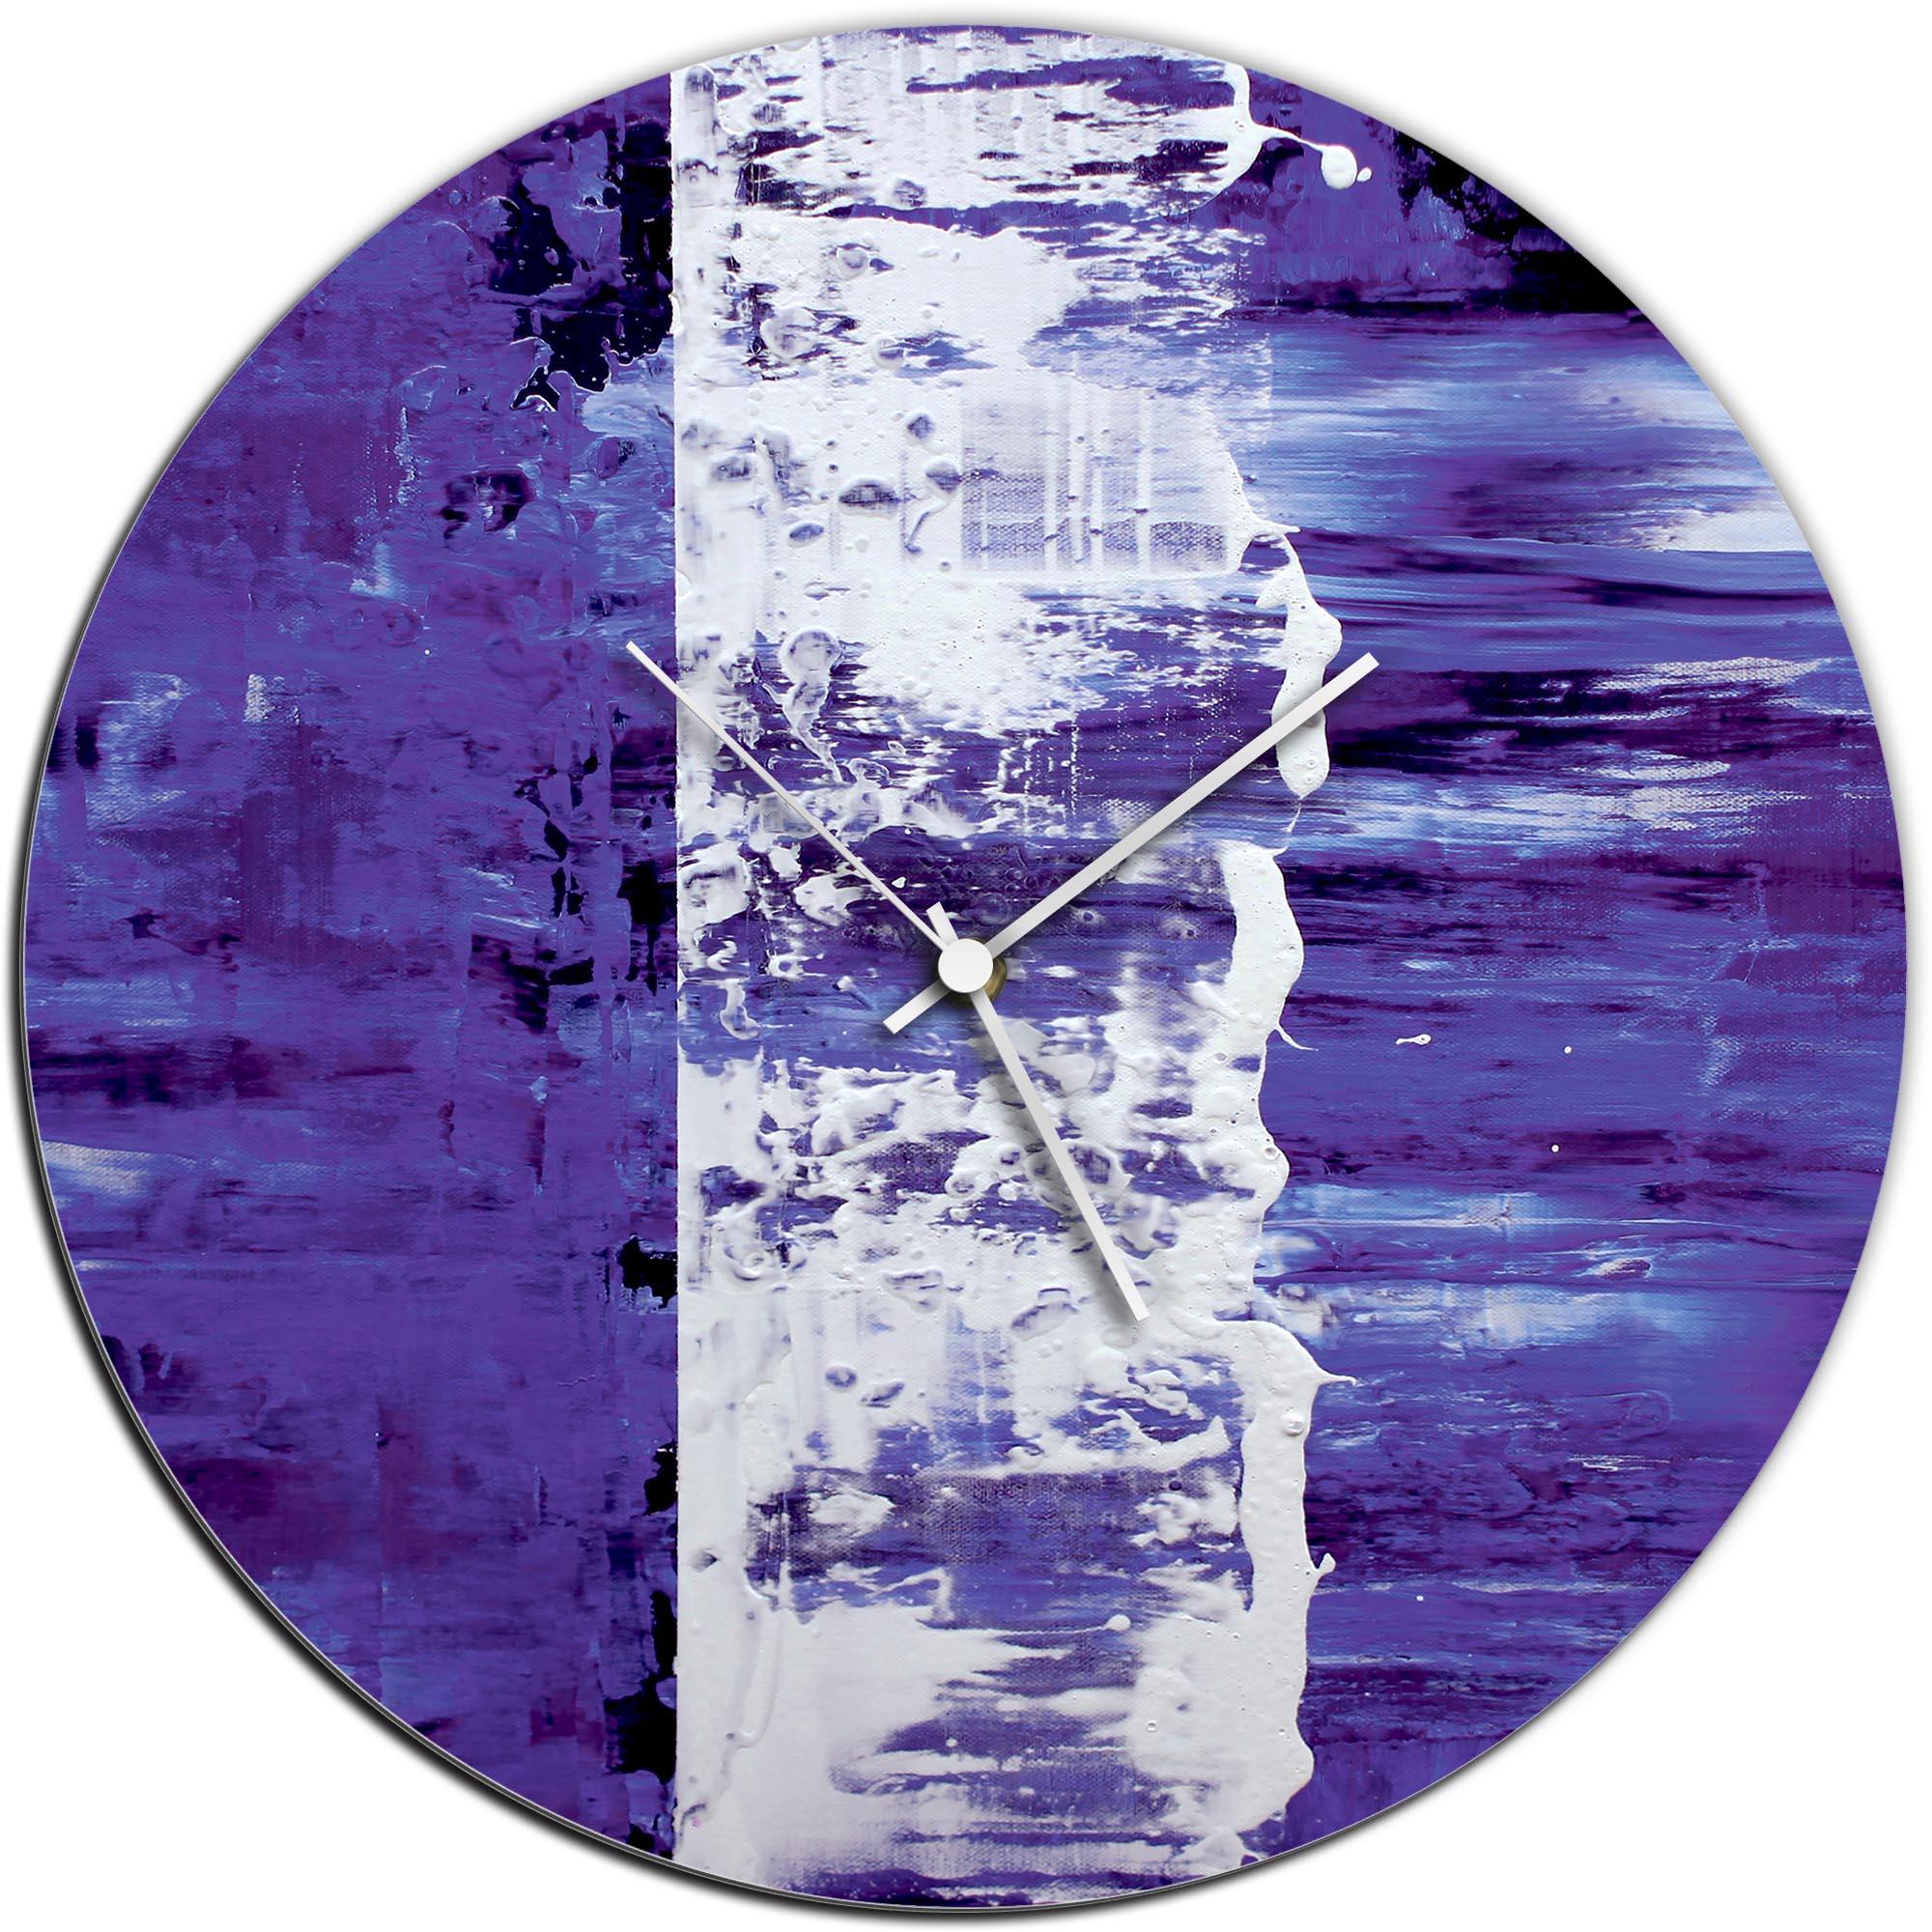 Mendo Vasilevski 'Purple Street Circle Clock' 16in x 16in Modern Wall Clock on Aluminum Composite